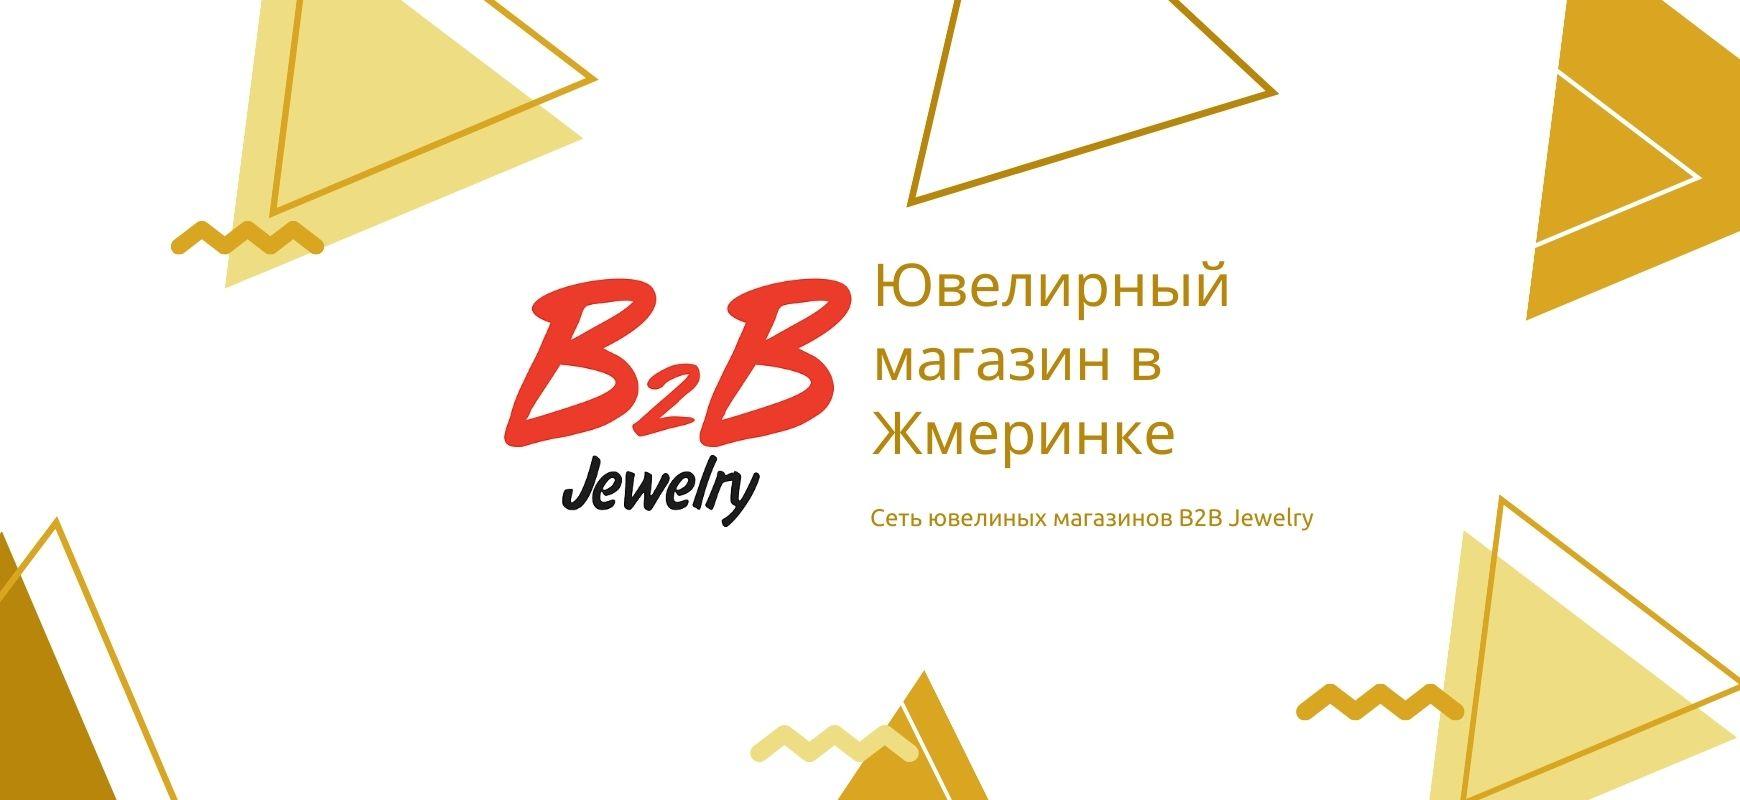 B2B JEWELRY ЖМЕРИНКА